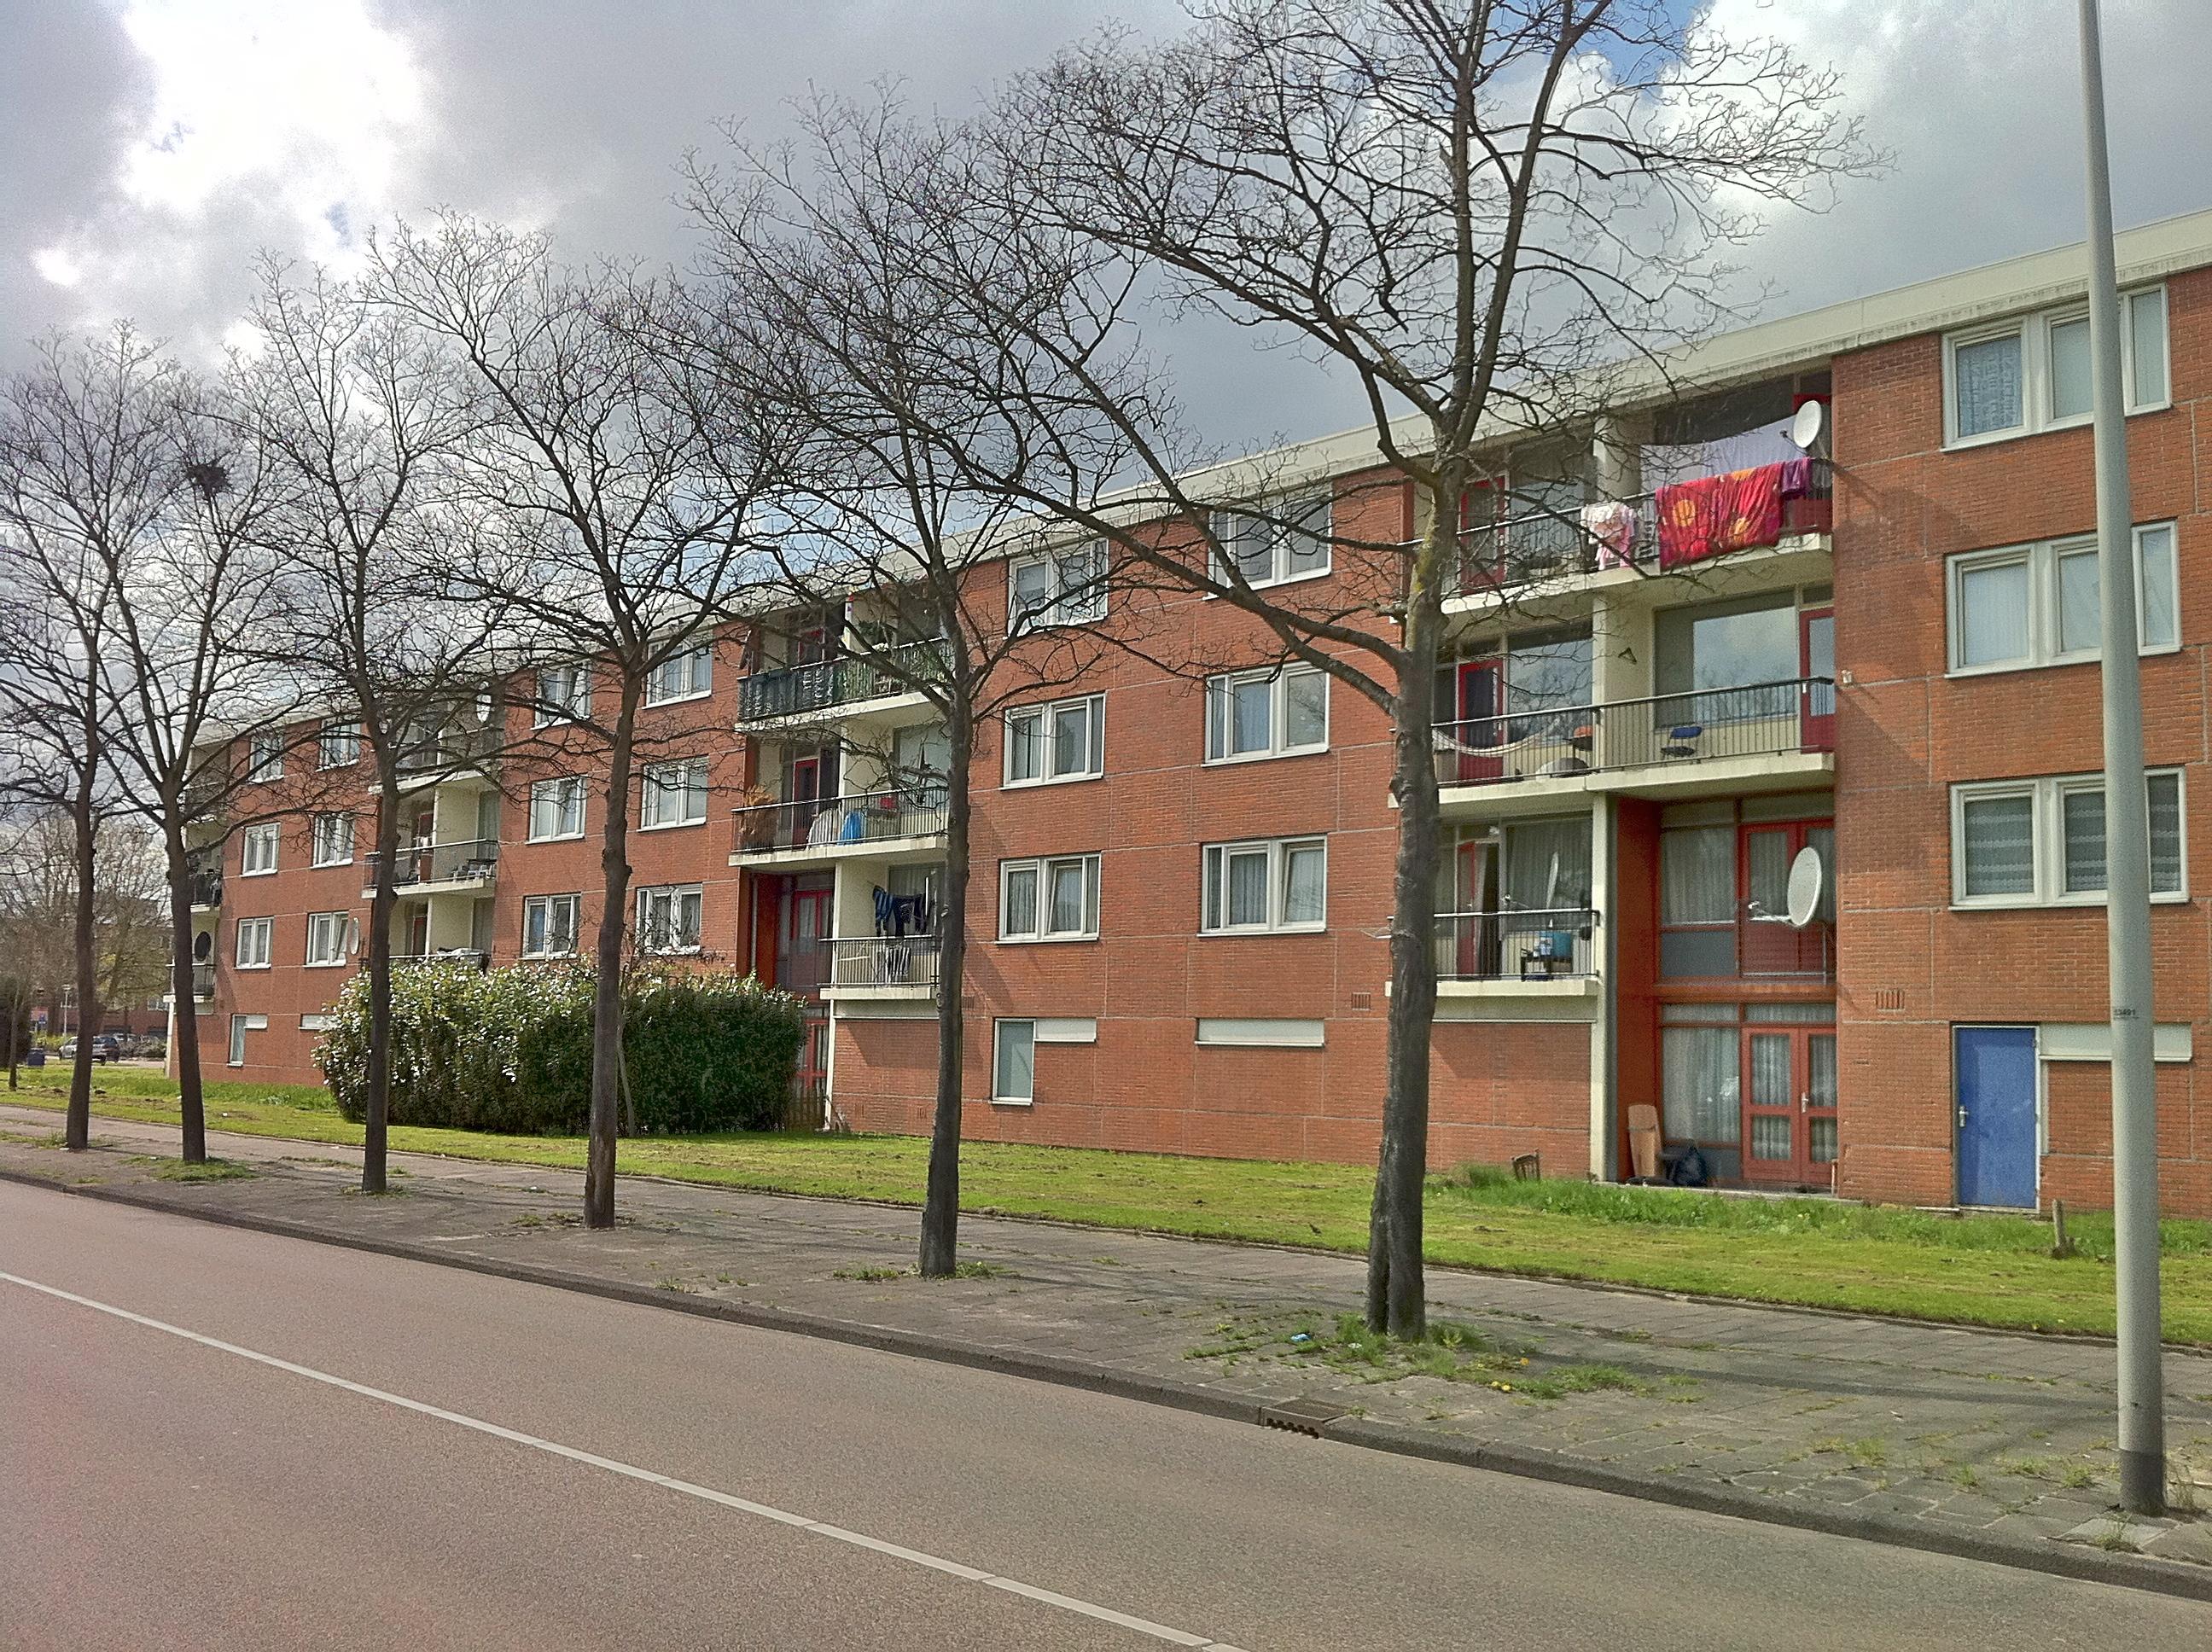 gratis seks previews priveontvangst amsterdam noord